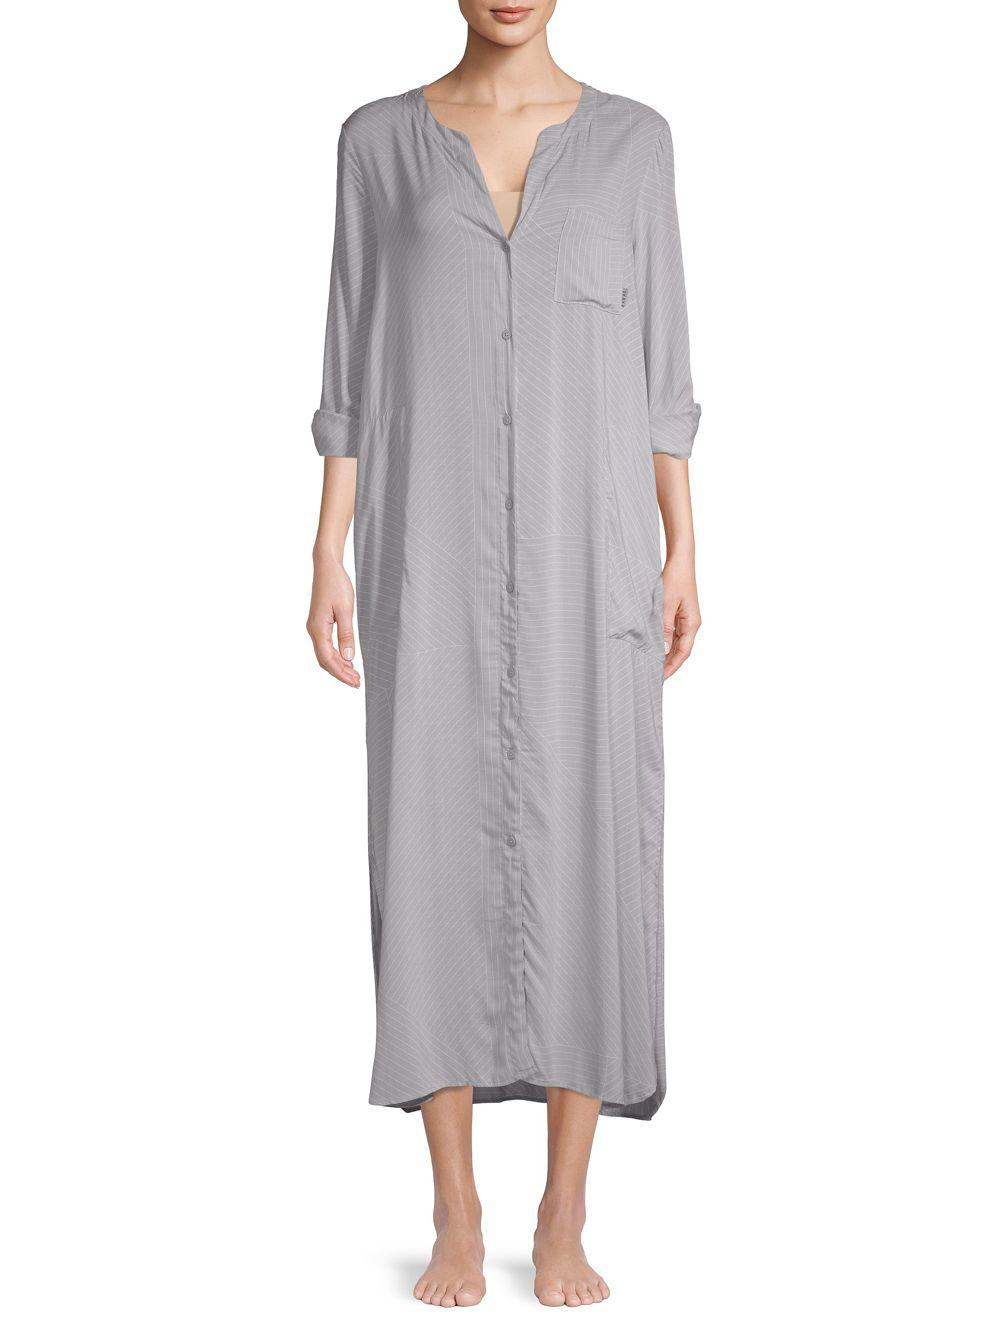 Lyst - Dkny Printed Split Neck Sleep Gown in Gray